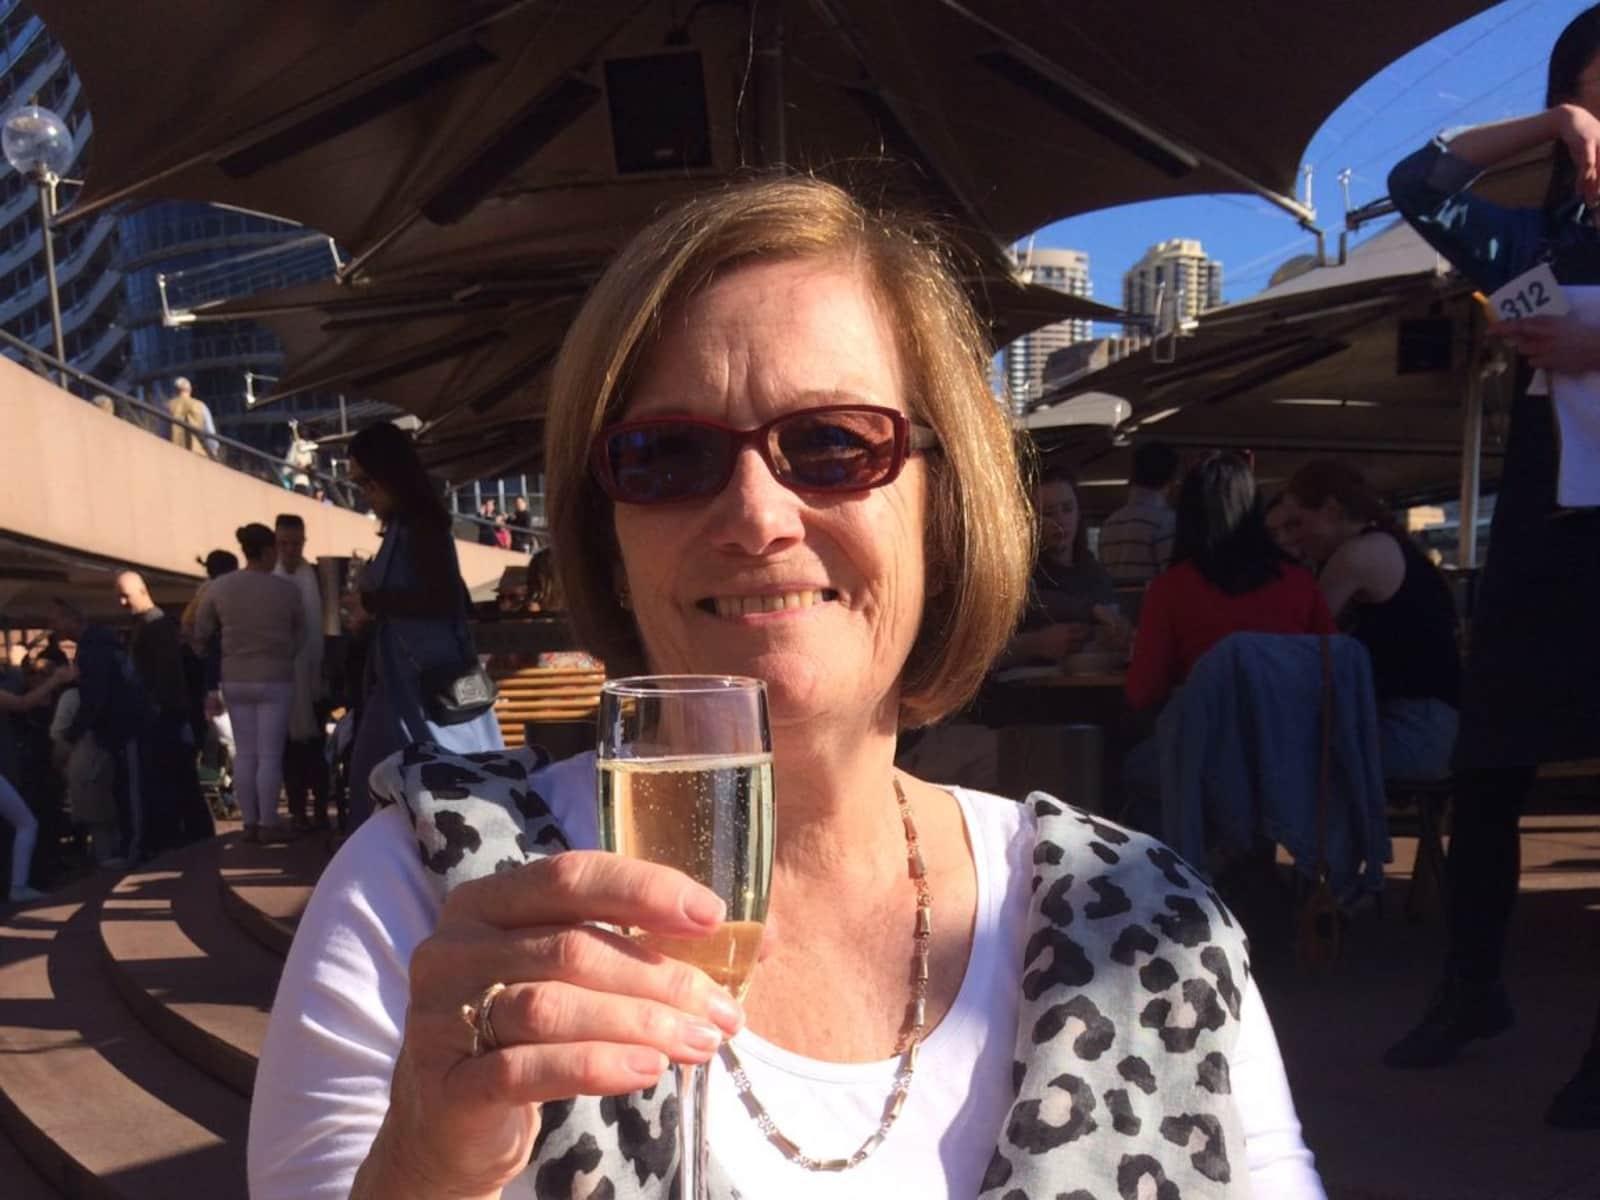 Elizabeth from Bournemouth, United Kingdom